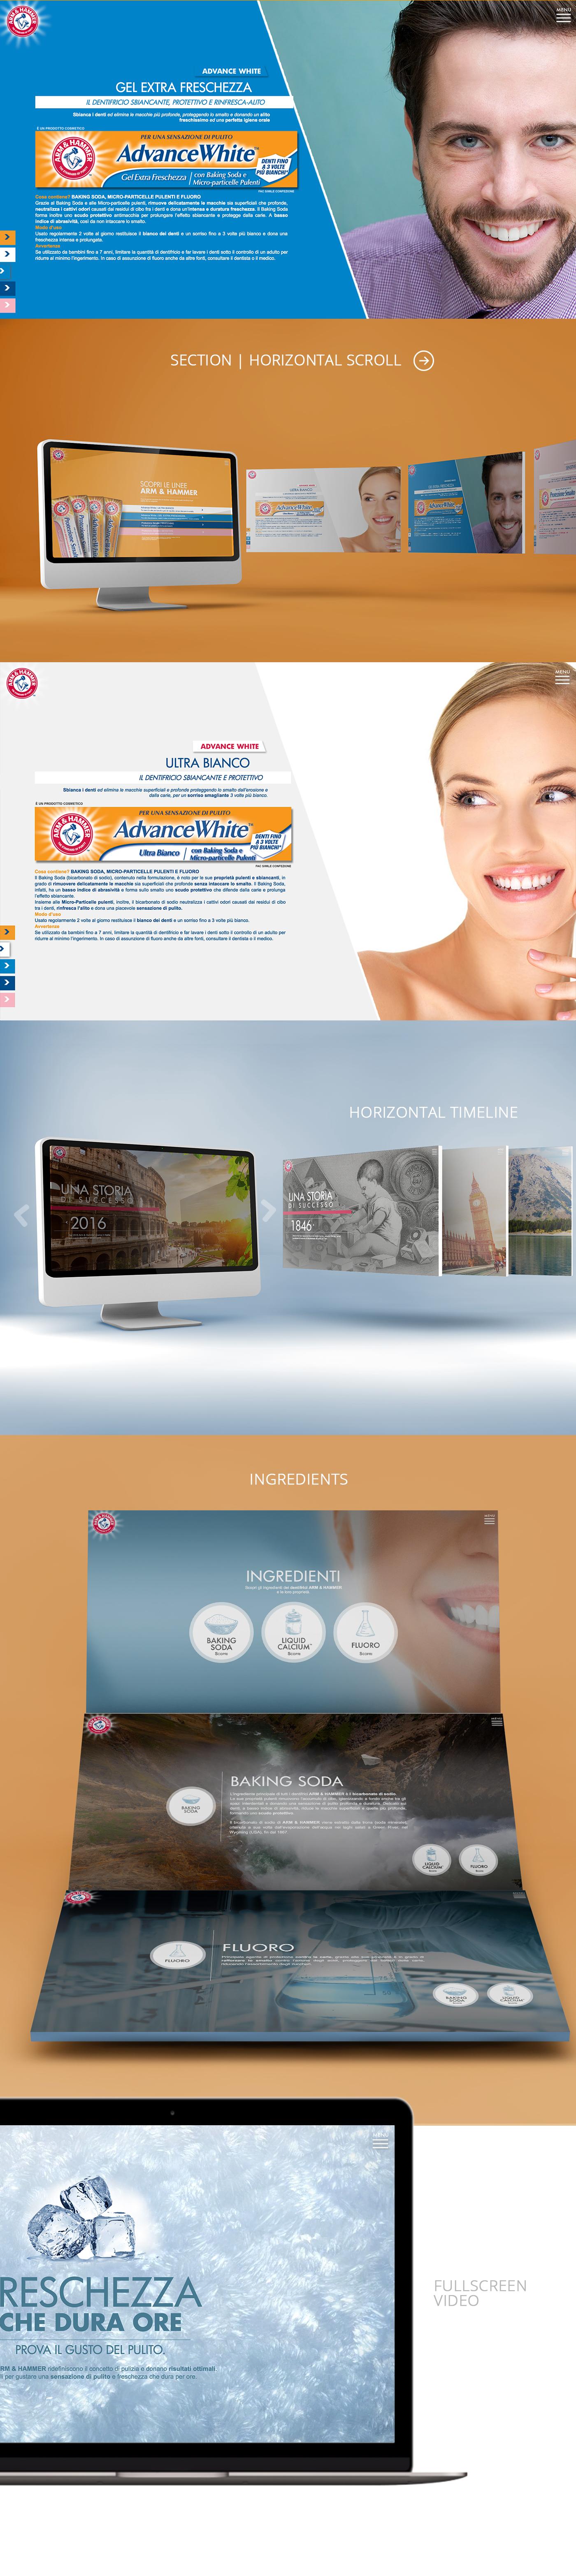 Website Webdesign art direction  design Responsive fresh clean modern branding  rwd ArtDirection brand toothpaste